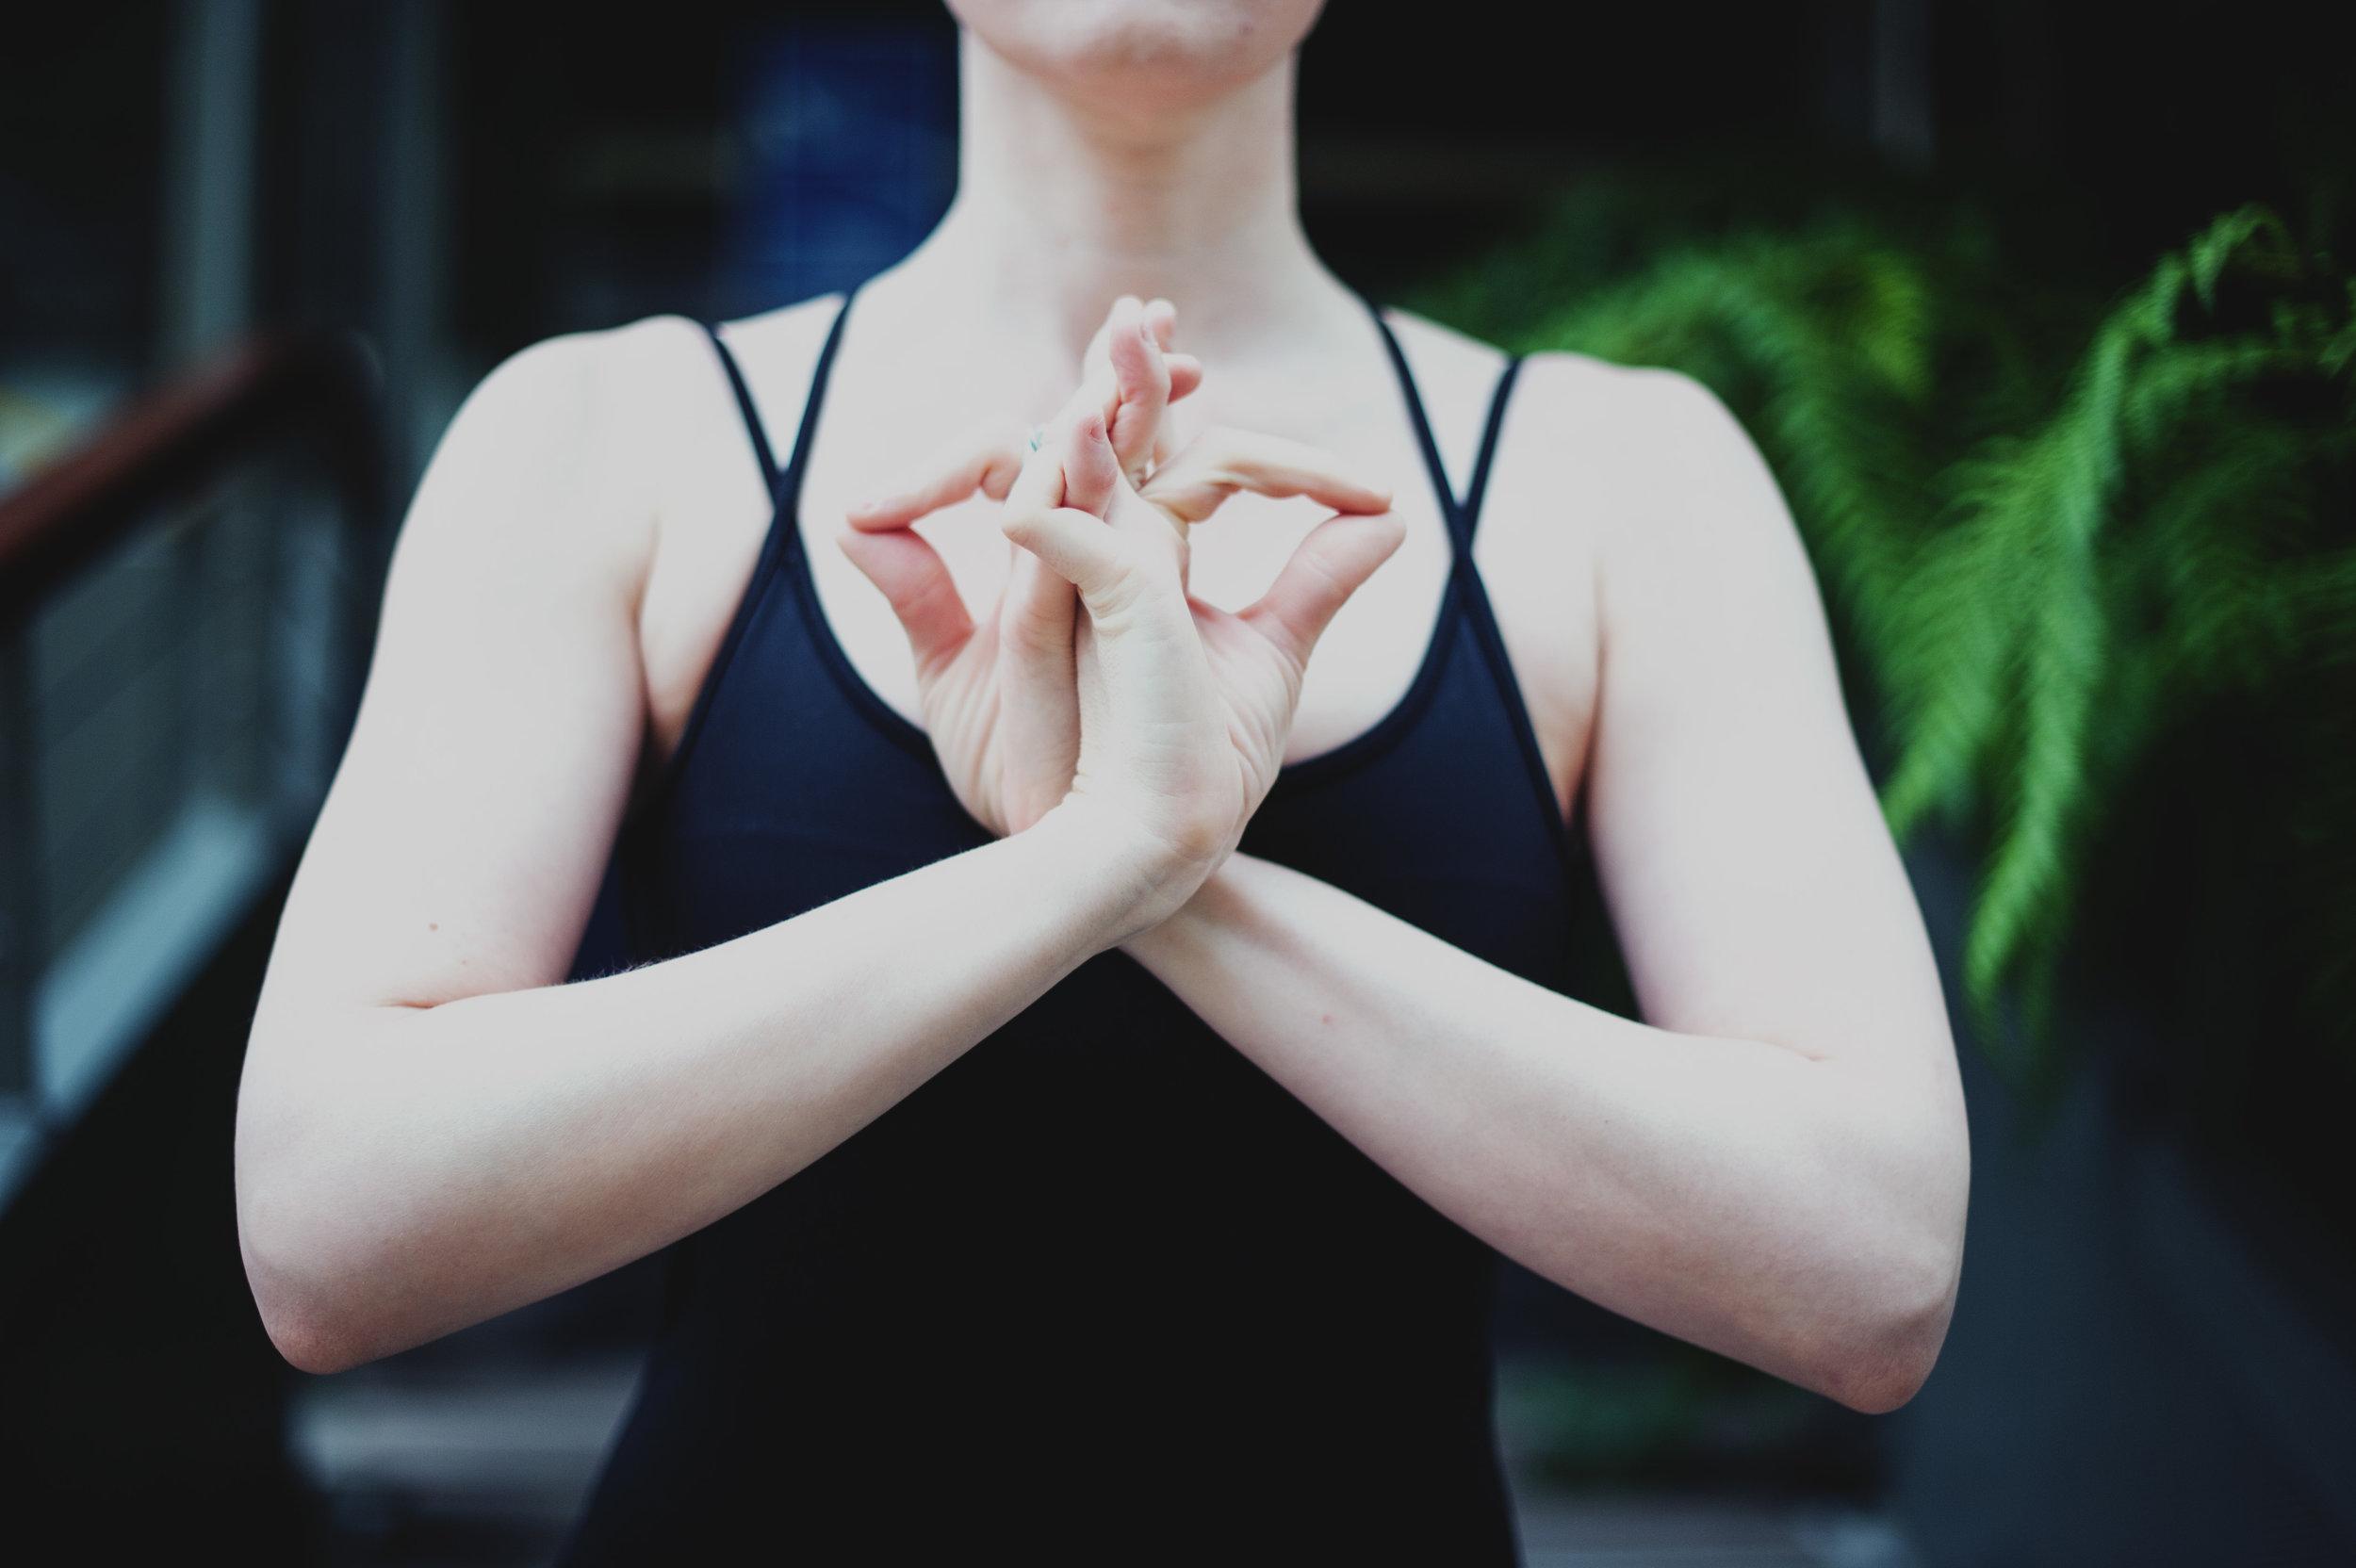 yoga-foto-mudra-sinnlich.jpg